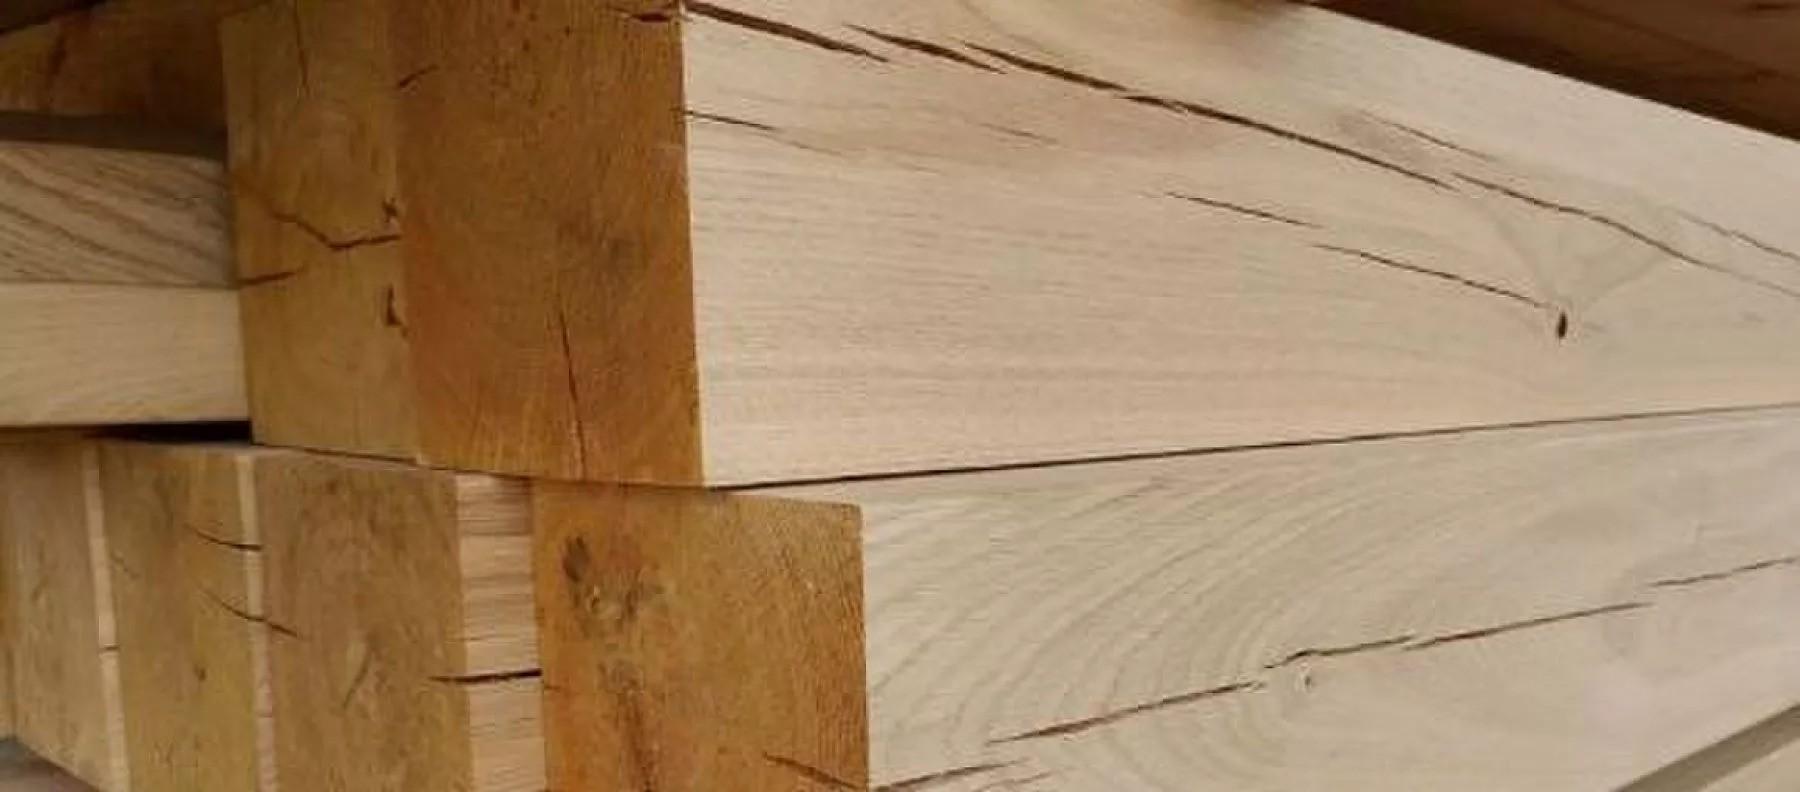 Risse im Holz